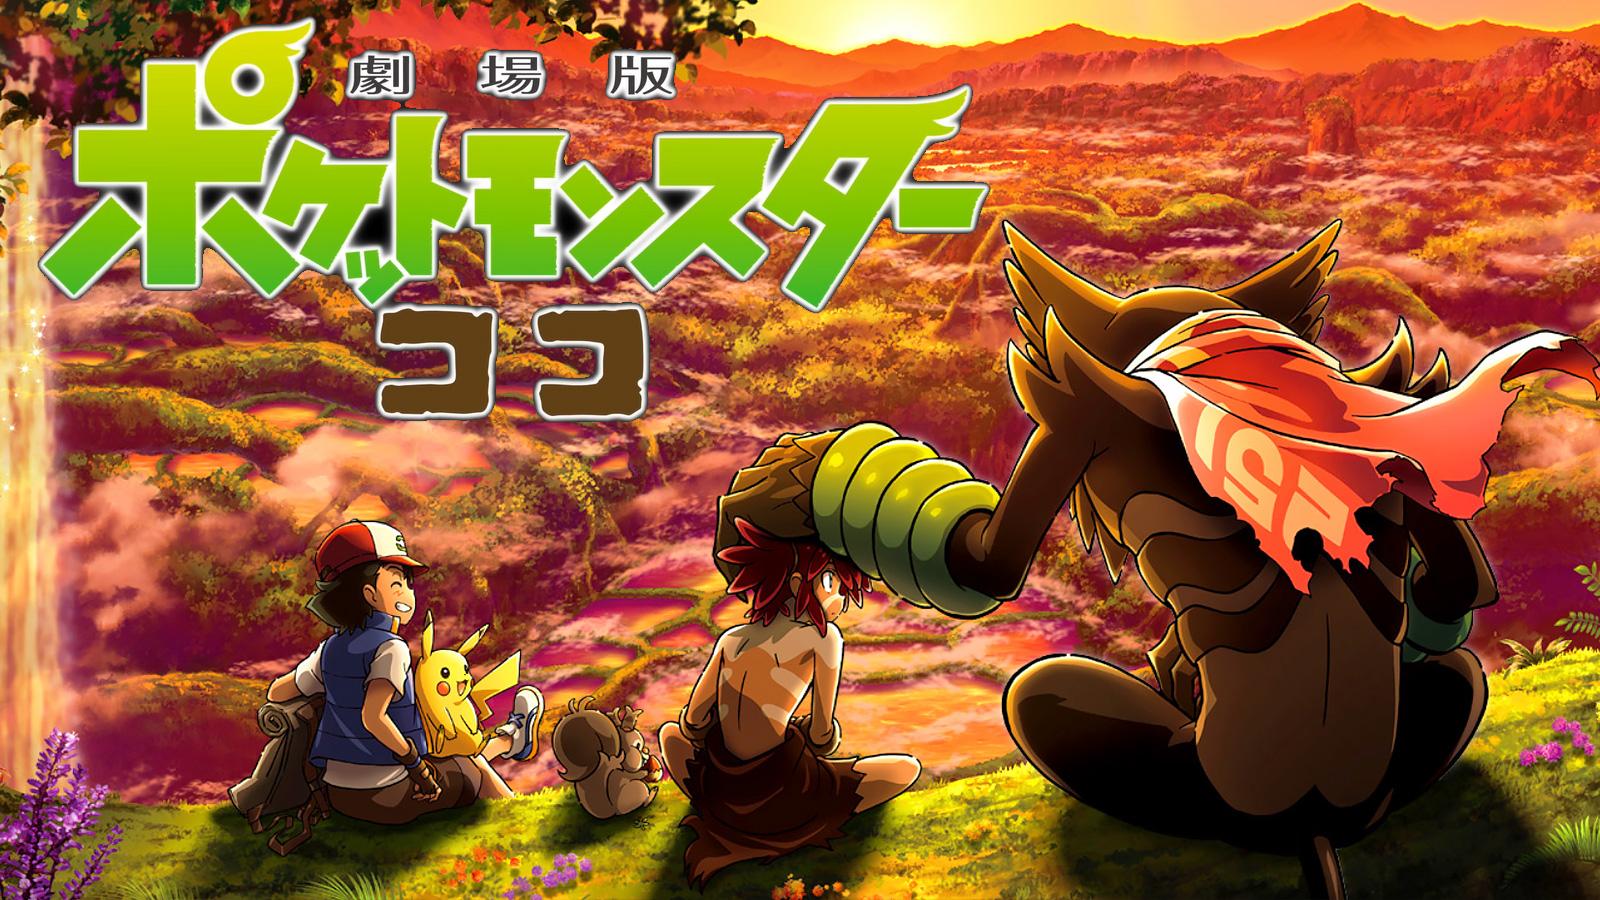 pokemon coco movie poster